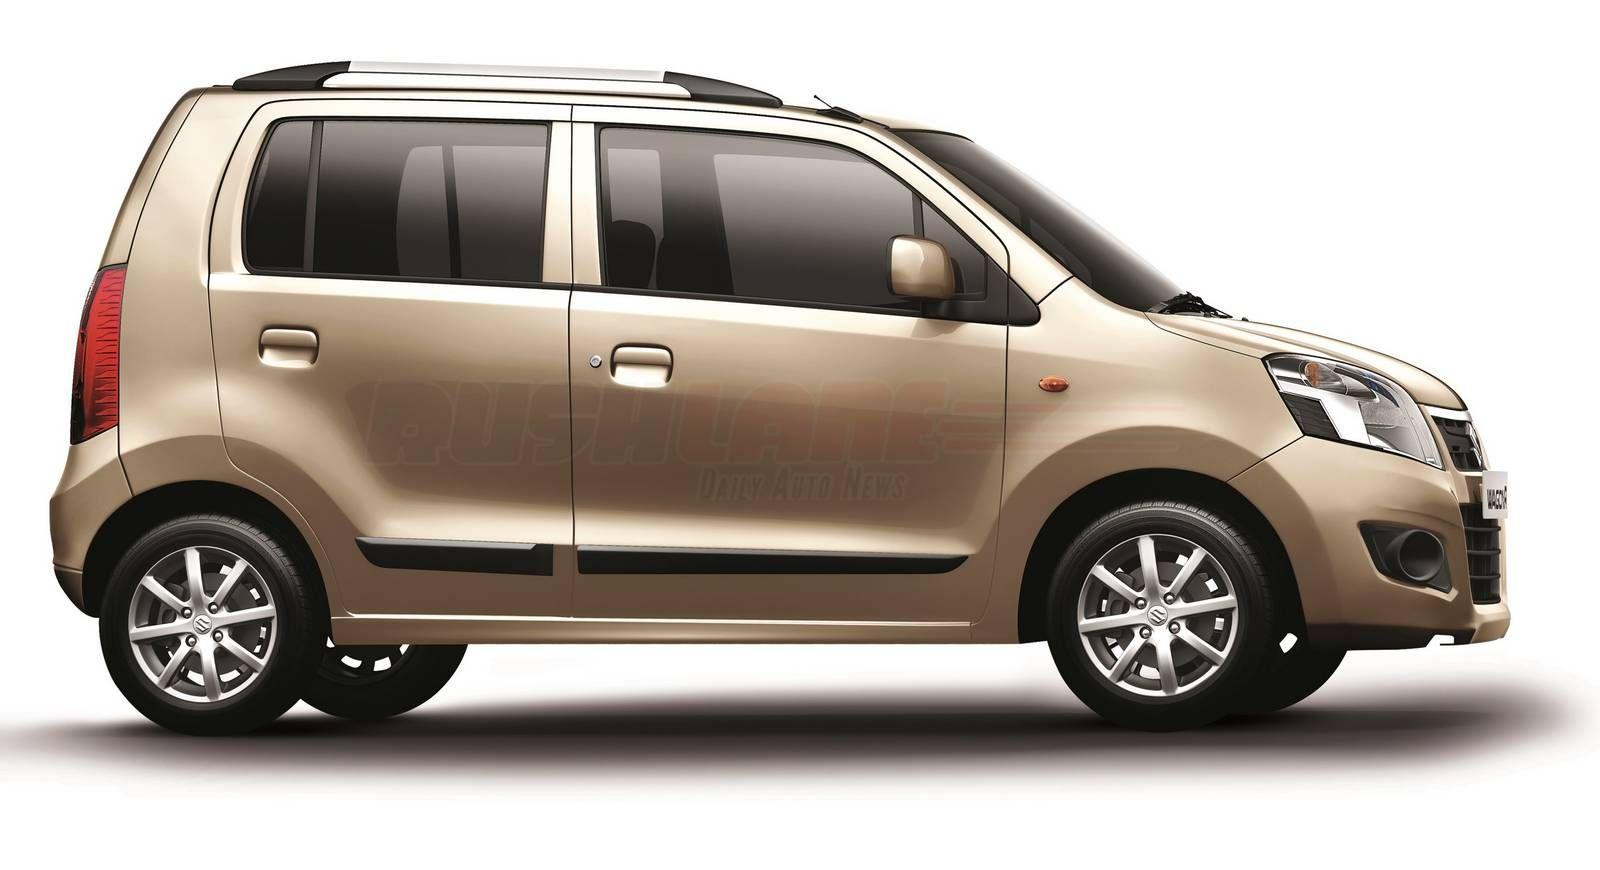 Find All New Maruti Suzuki Car Listings In Bangalore Browse